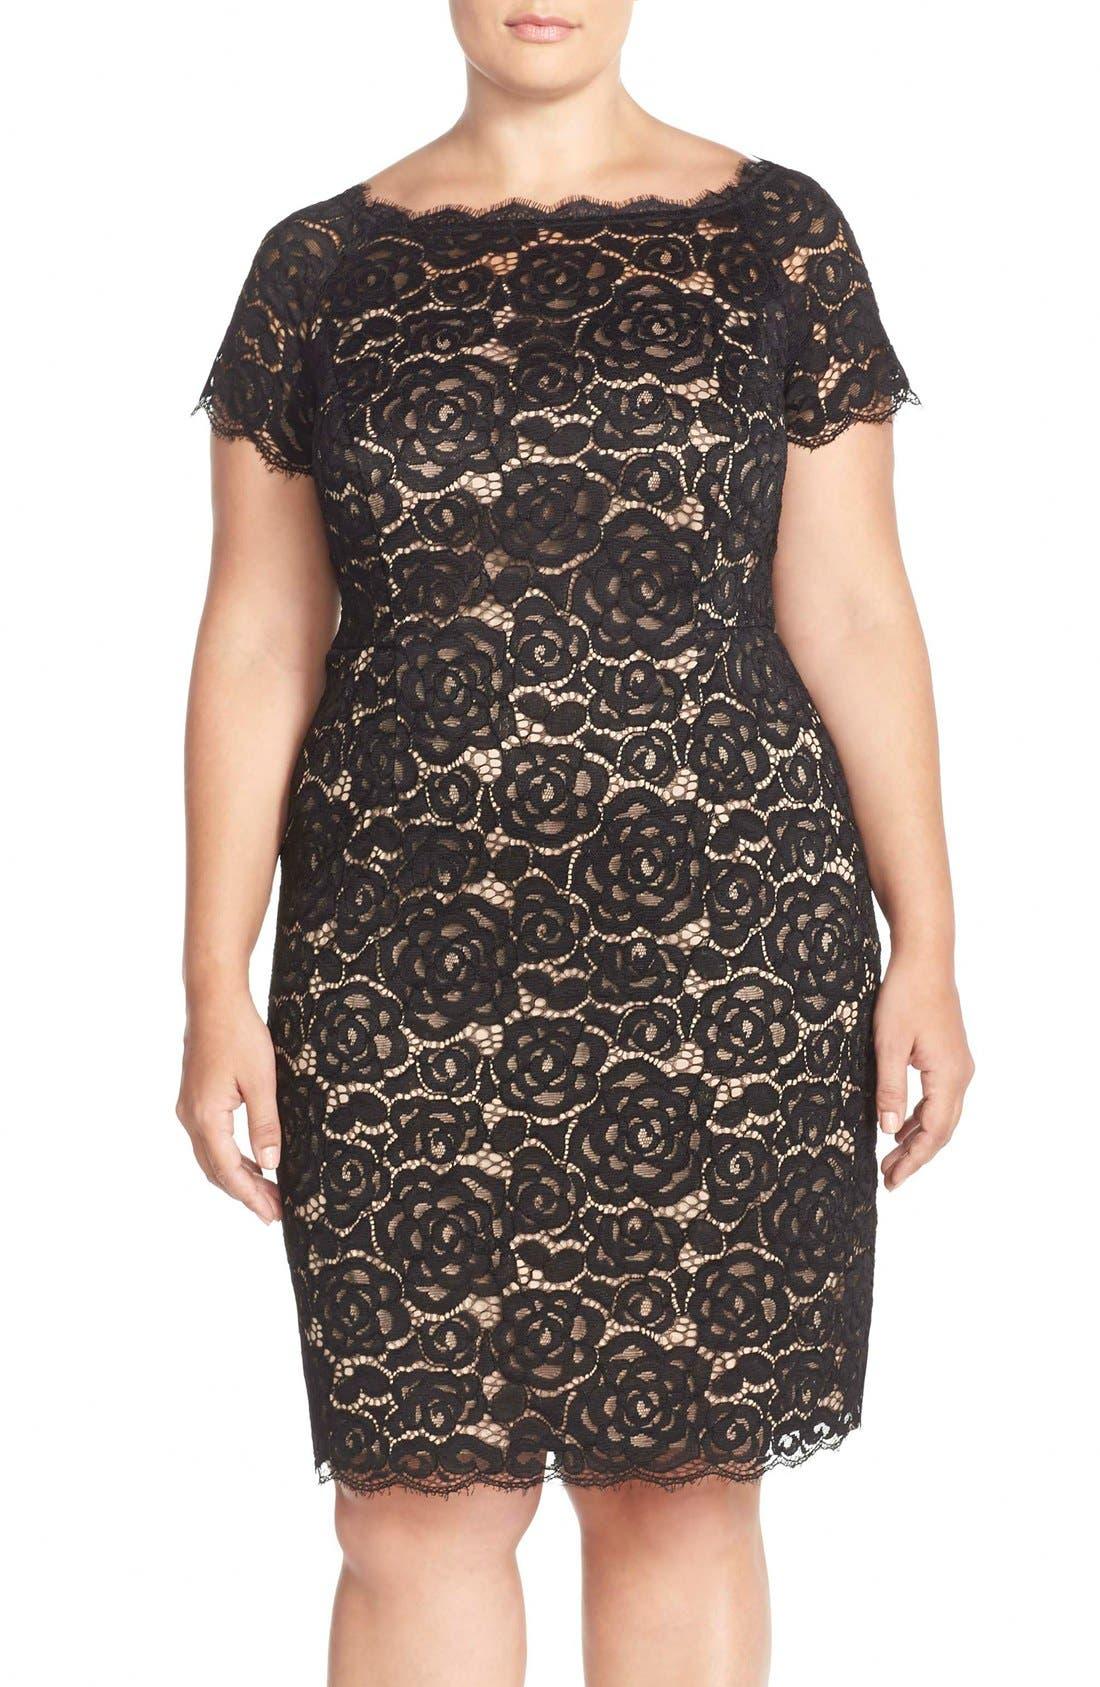 Off the Shoulder Lace Sheath Dress,                             Main thumbnail 1, color,                             BLACK/ NUDE